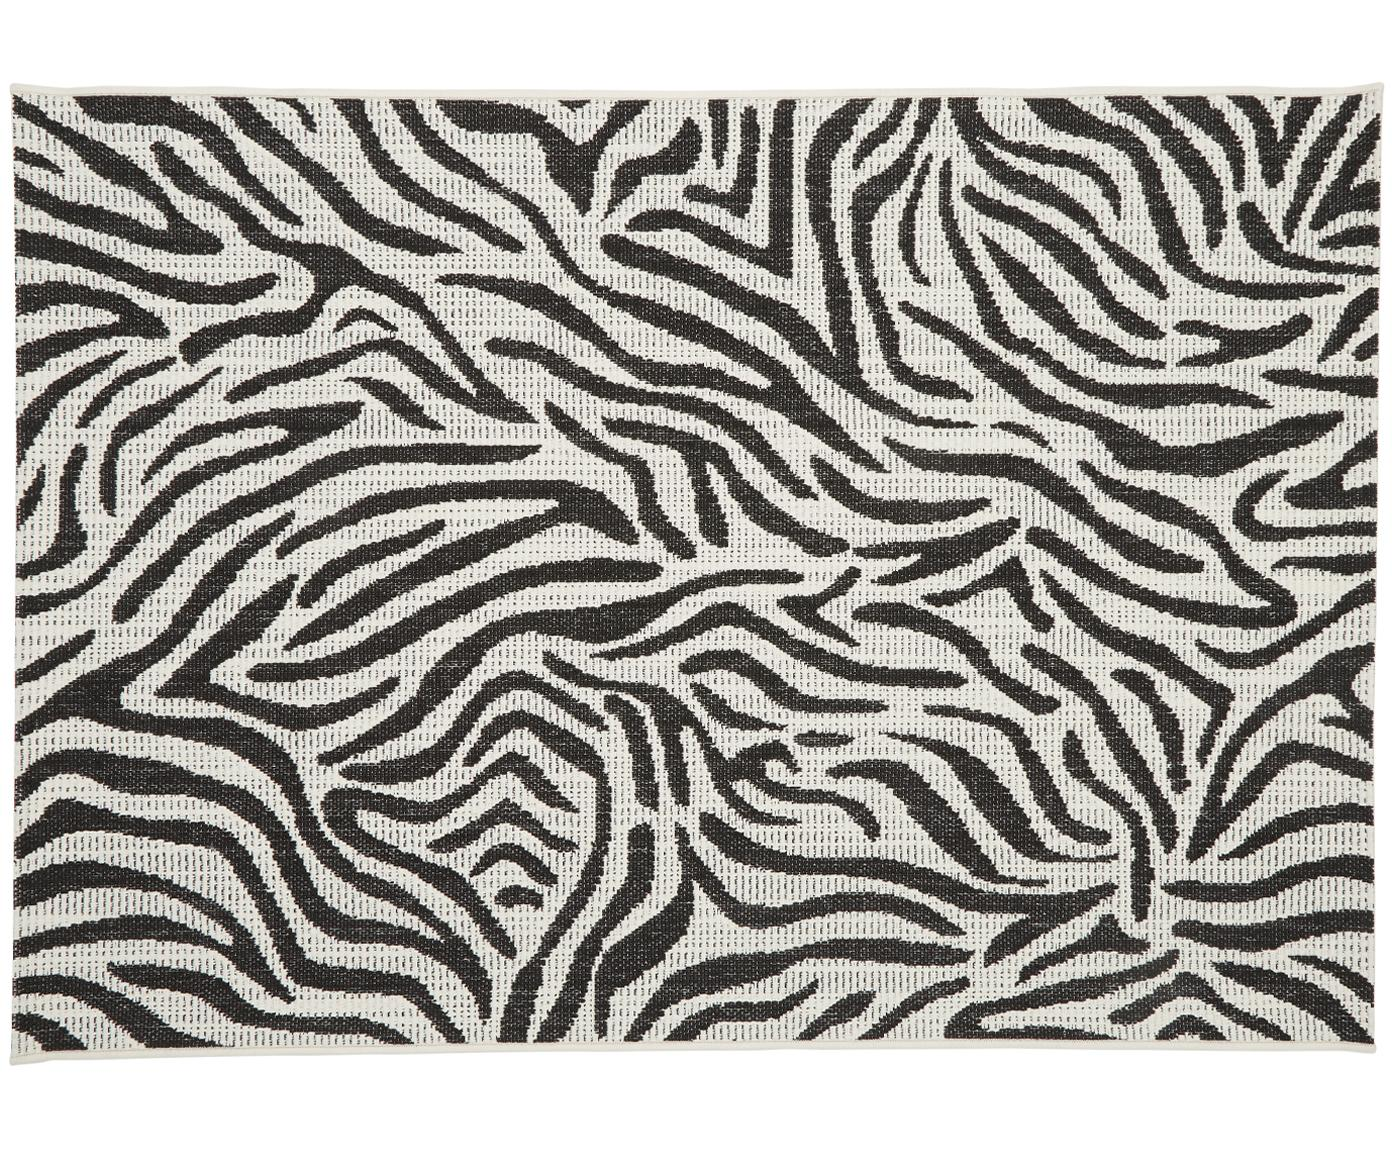 Alfombra de interior/exterior Exotic, Parte superior: polipropileno, Reverso: poliéster, Blanco crema, negro, An 120 x L 170 cm (Tamaño S)